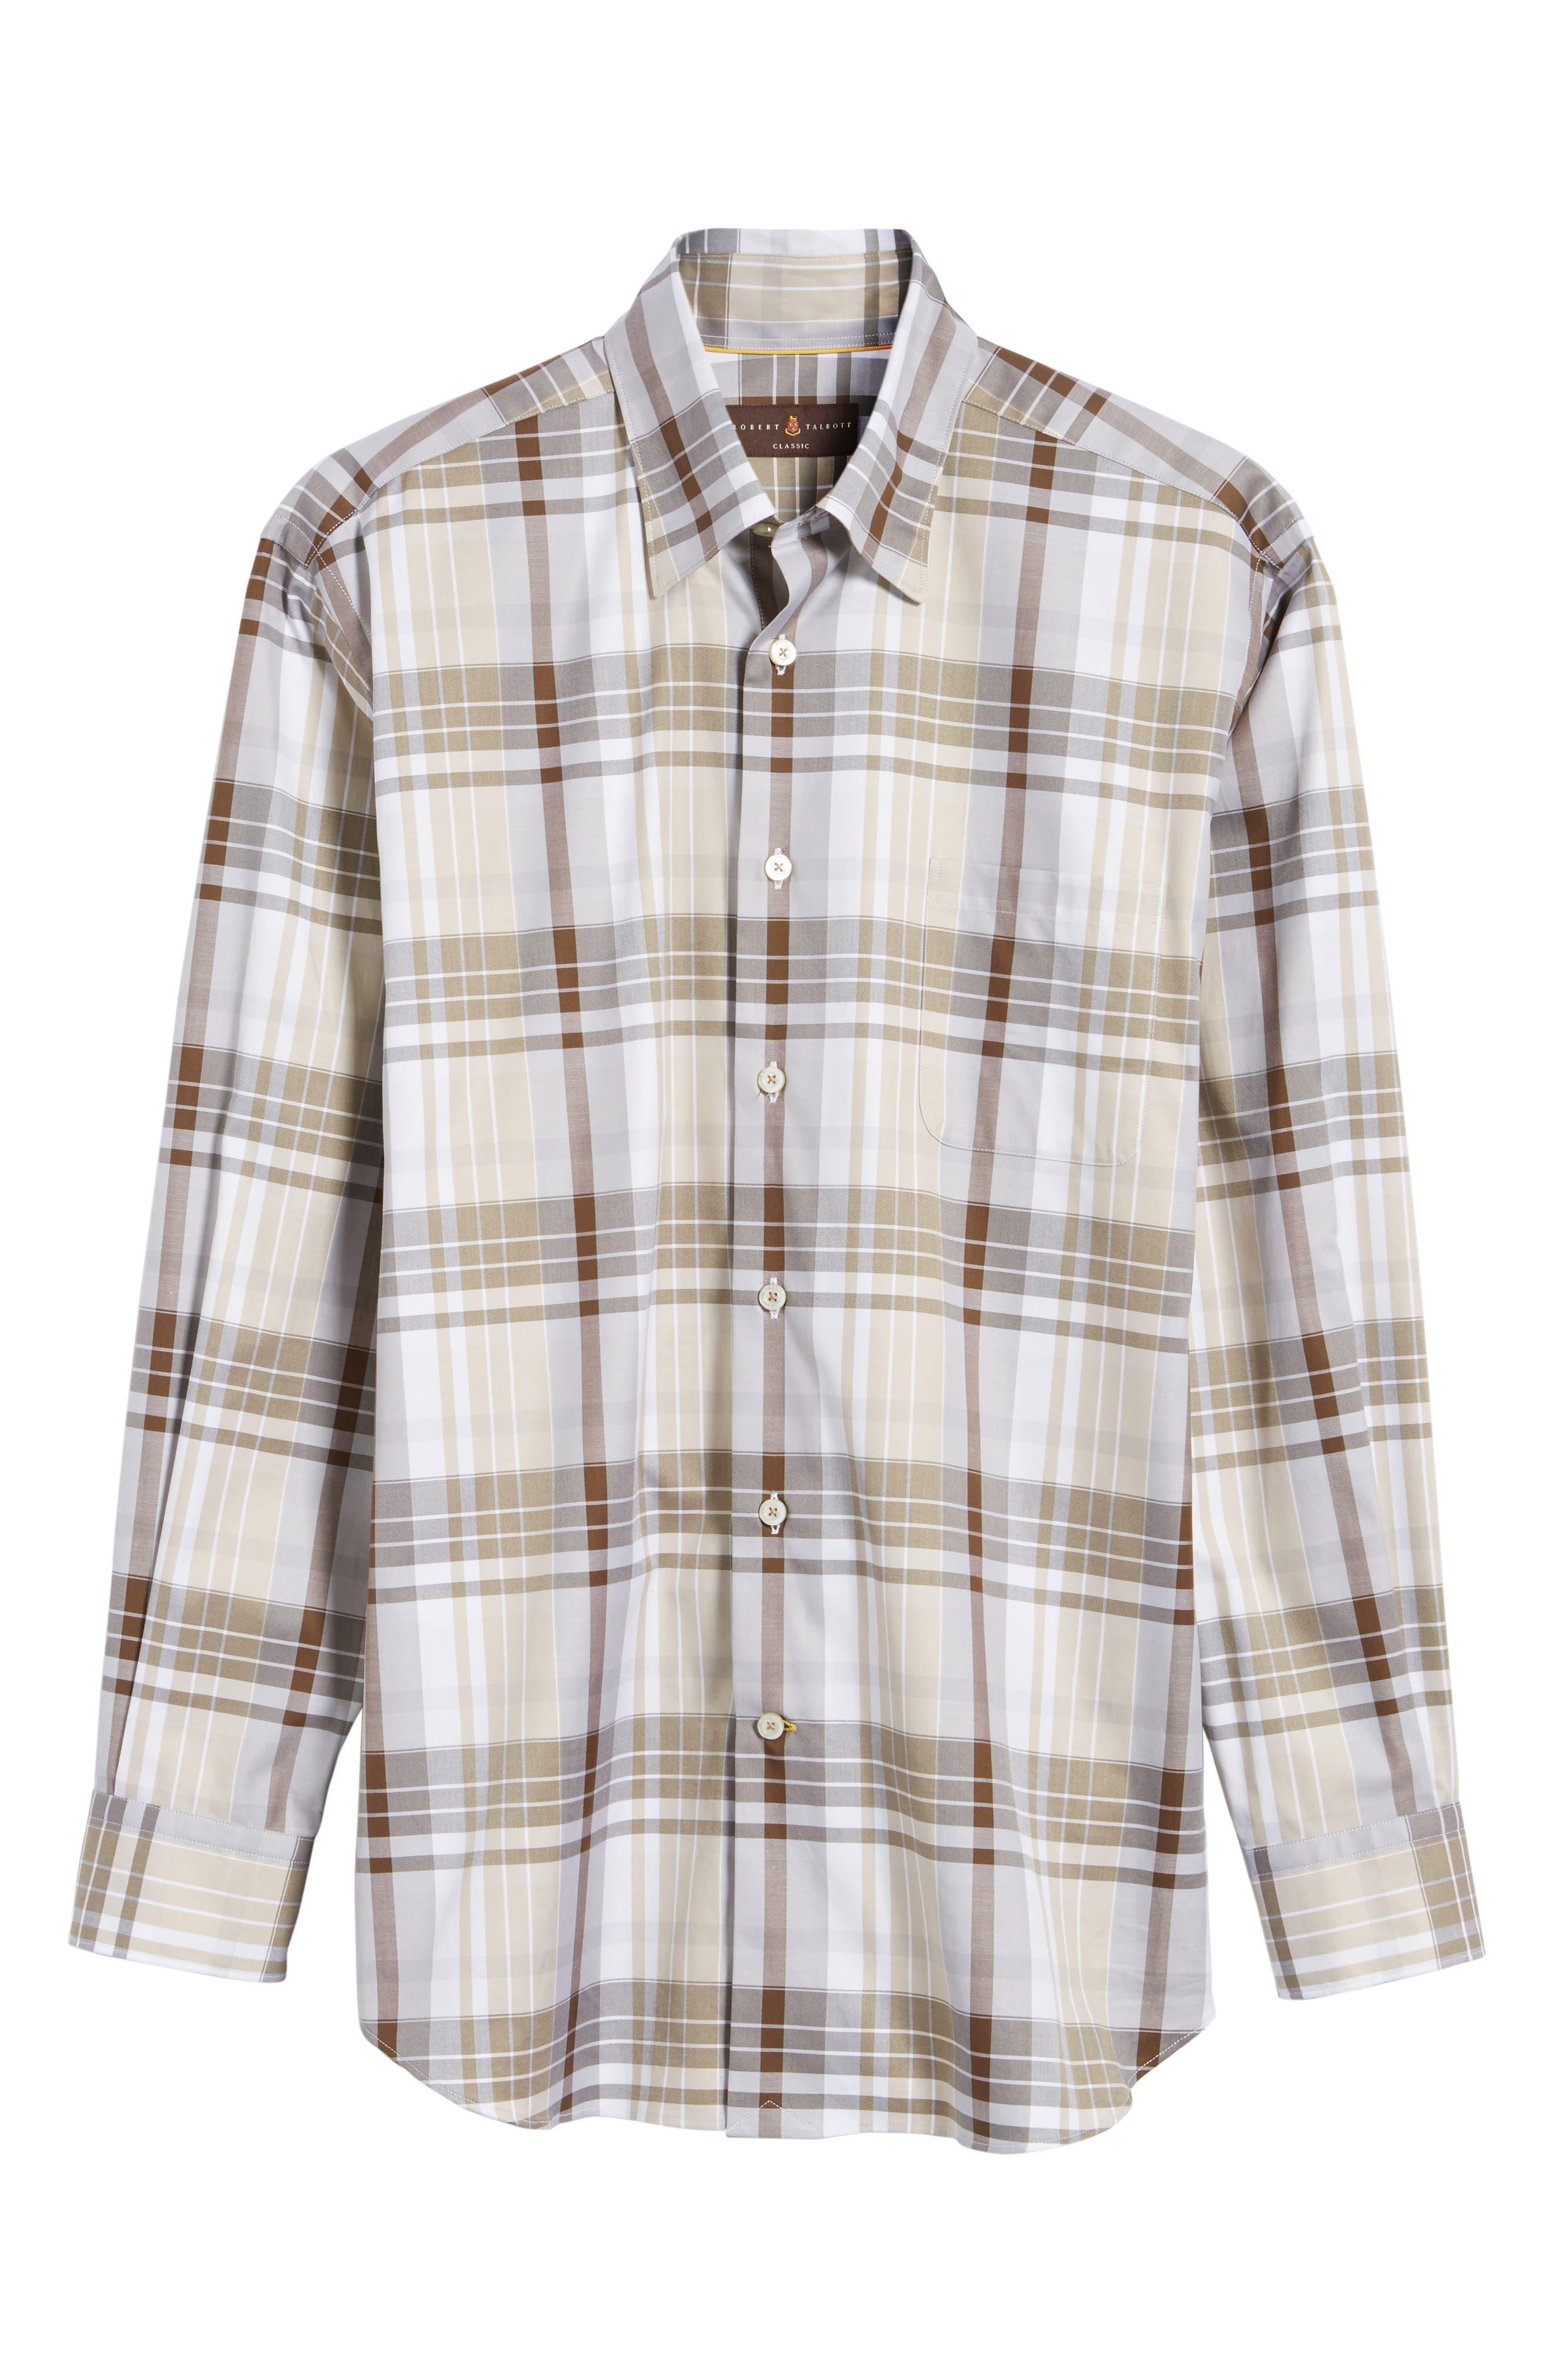 Anderson Classic Fit Plaid Micro Twill Sport Shirt,                             Alternate thumbnail 6, color,                             Desert